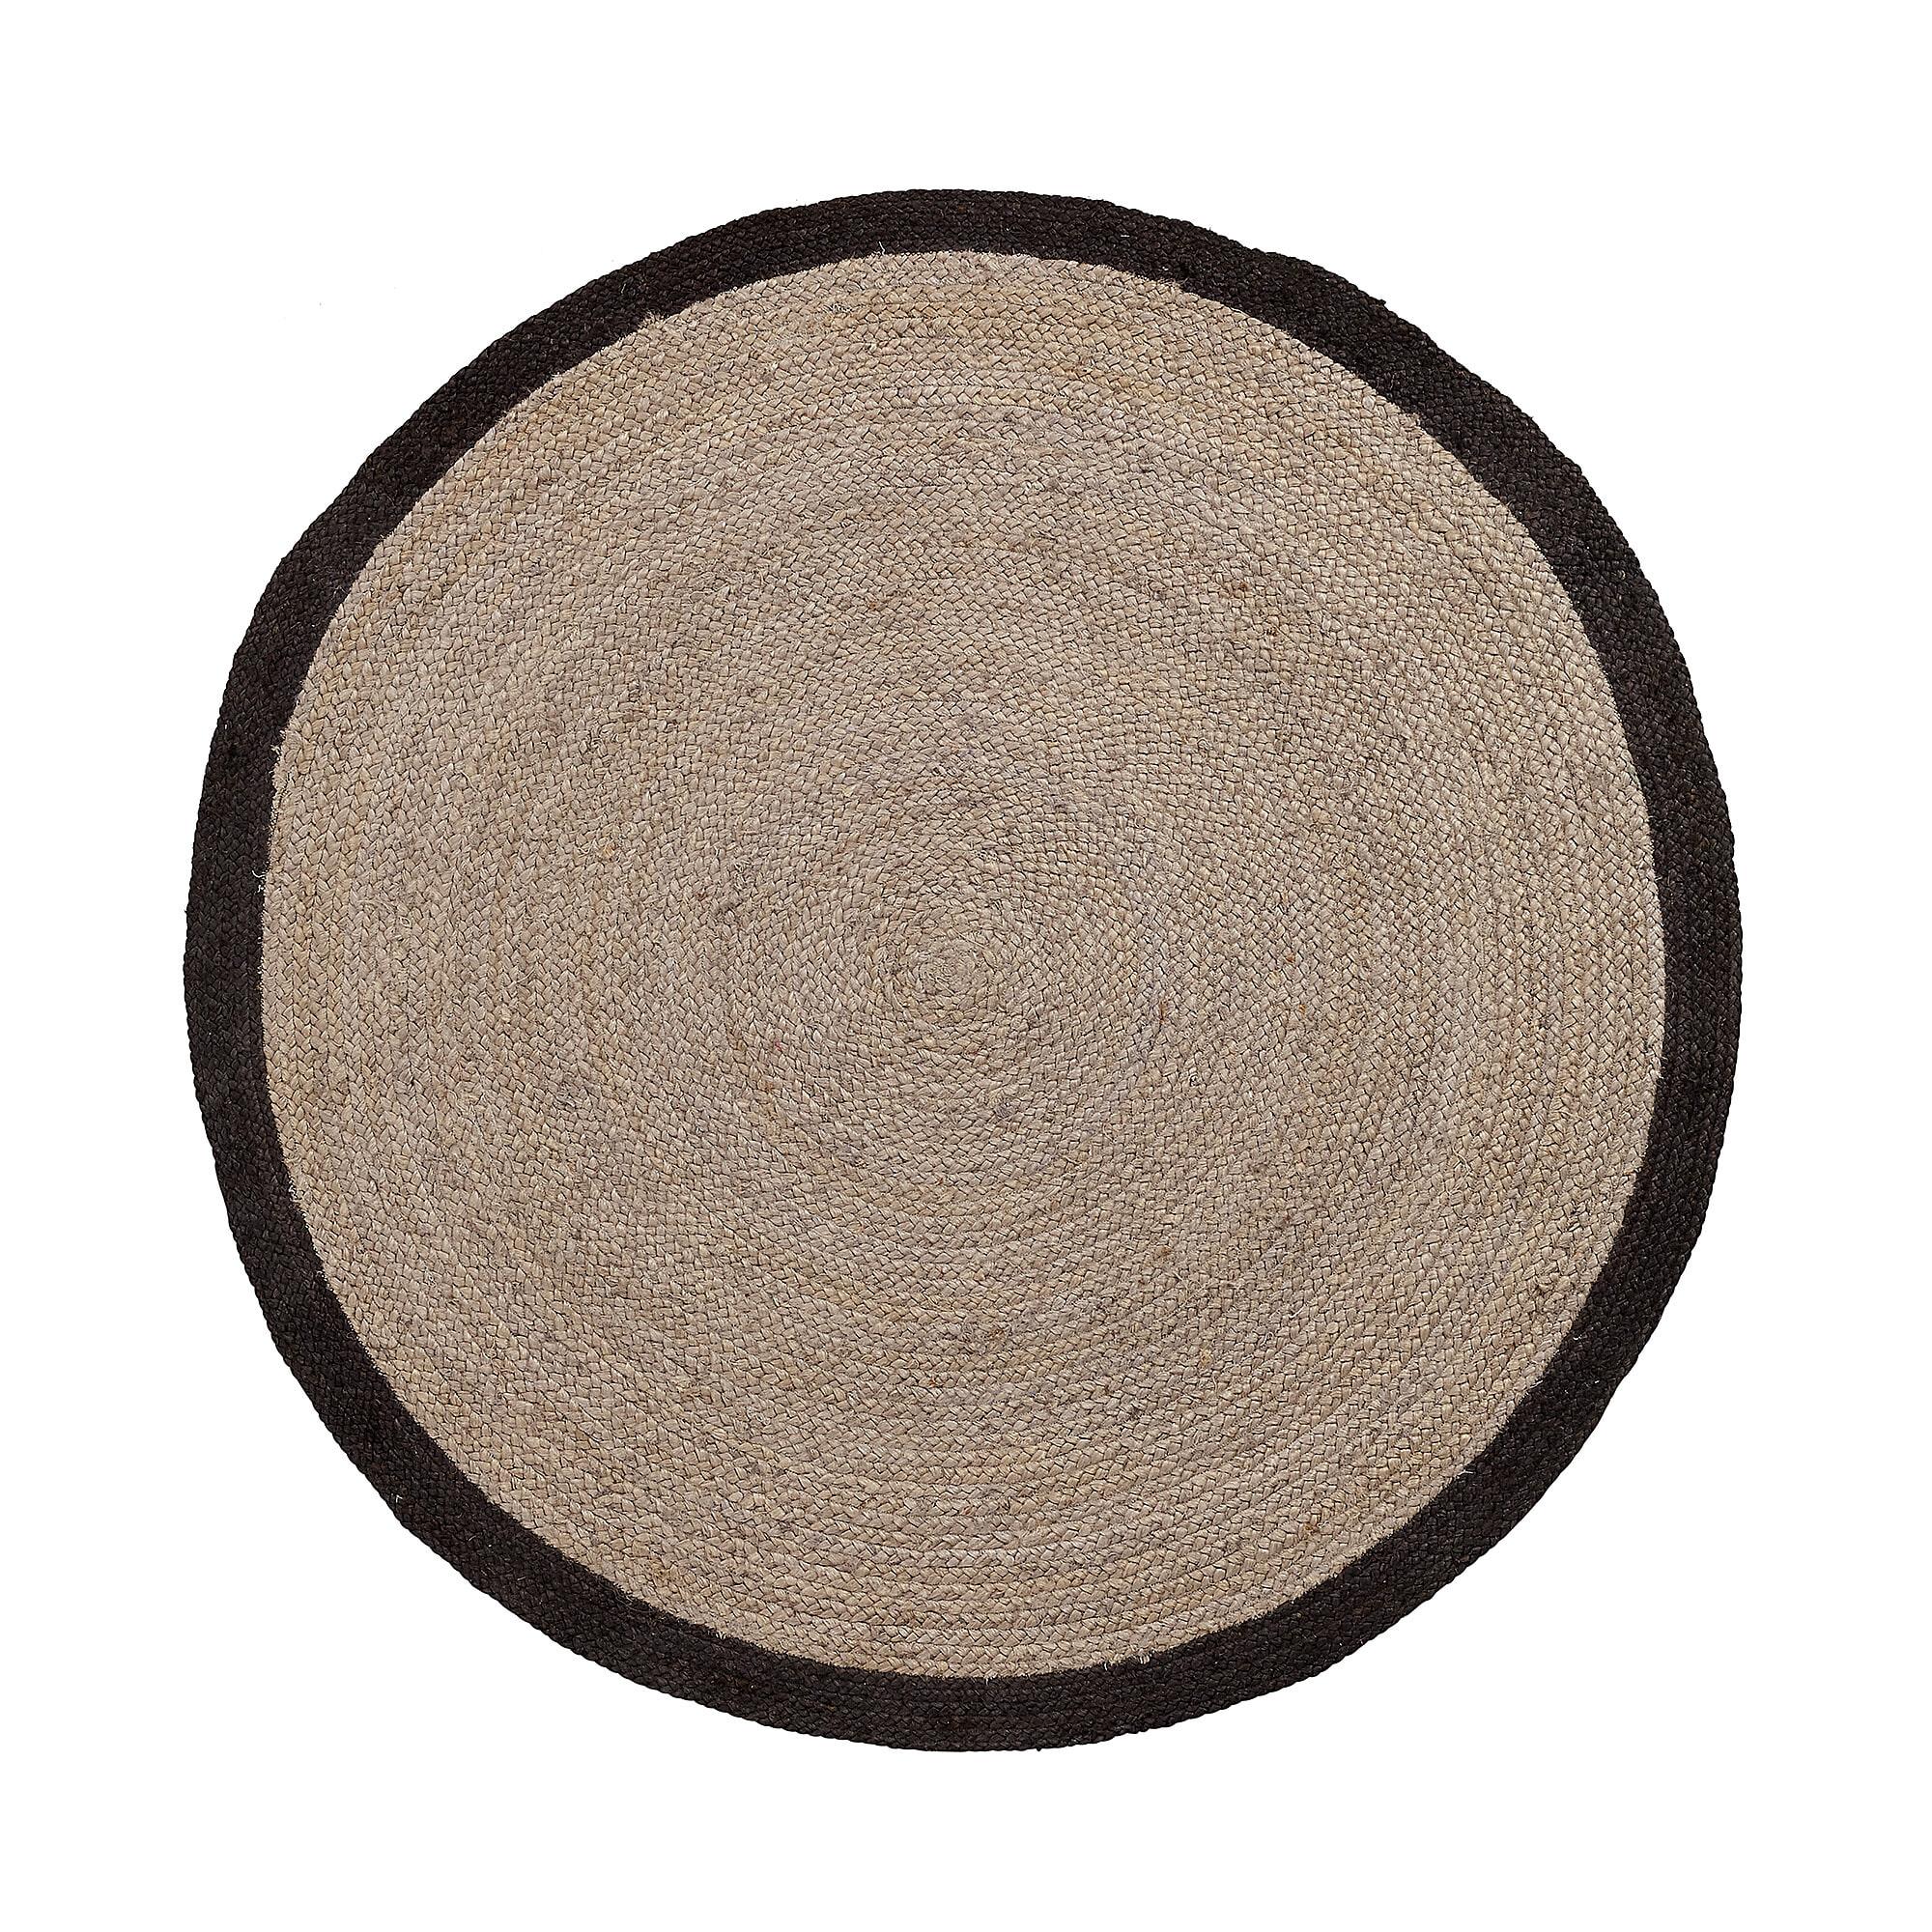 Kave Home rond vloerkleed 'Saht' jute 150cm, kleur zwart Jute aanschaffen? Kijk hier!